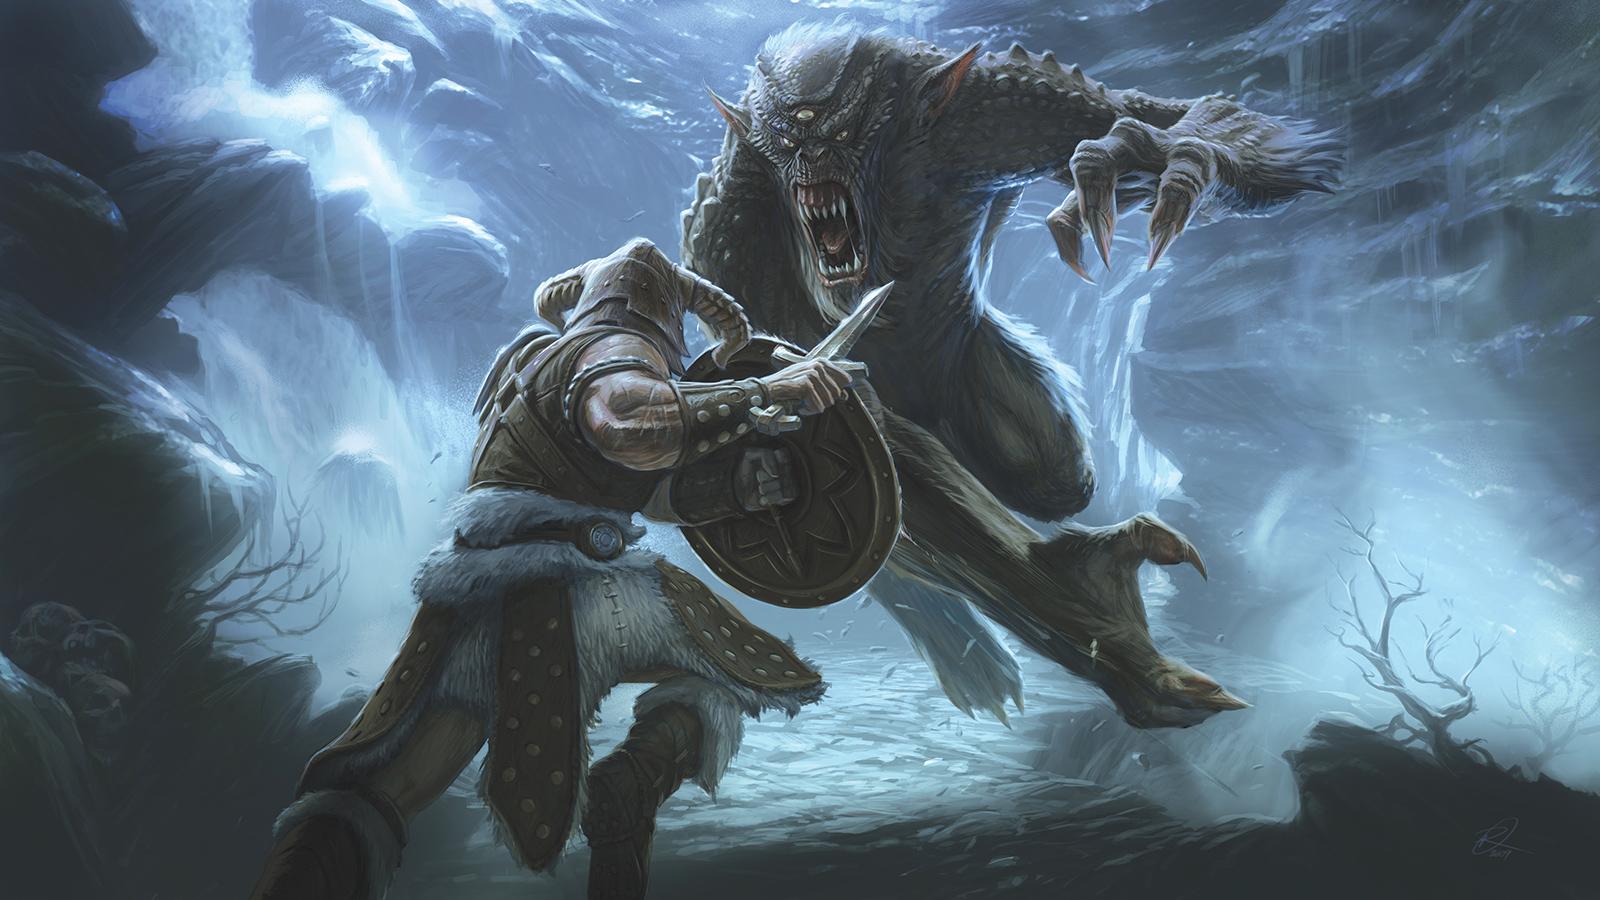 image gallery norse dragon wallpaper